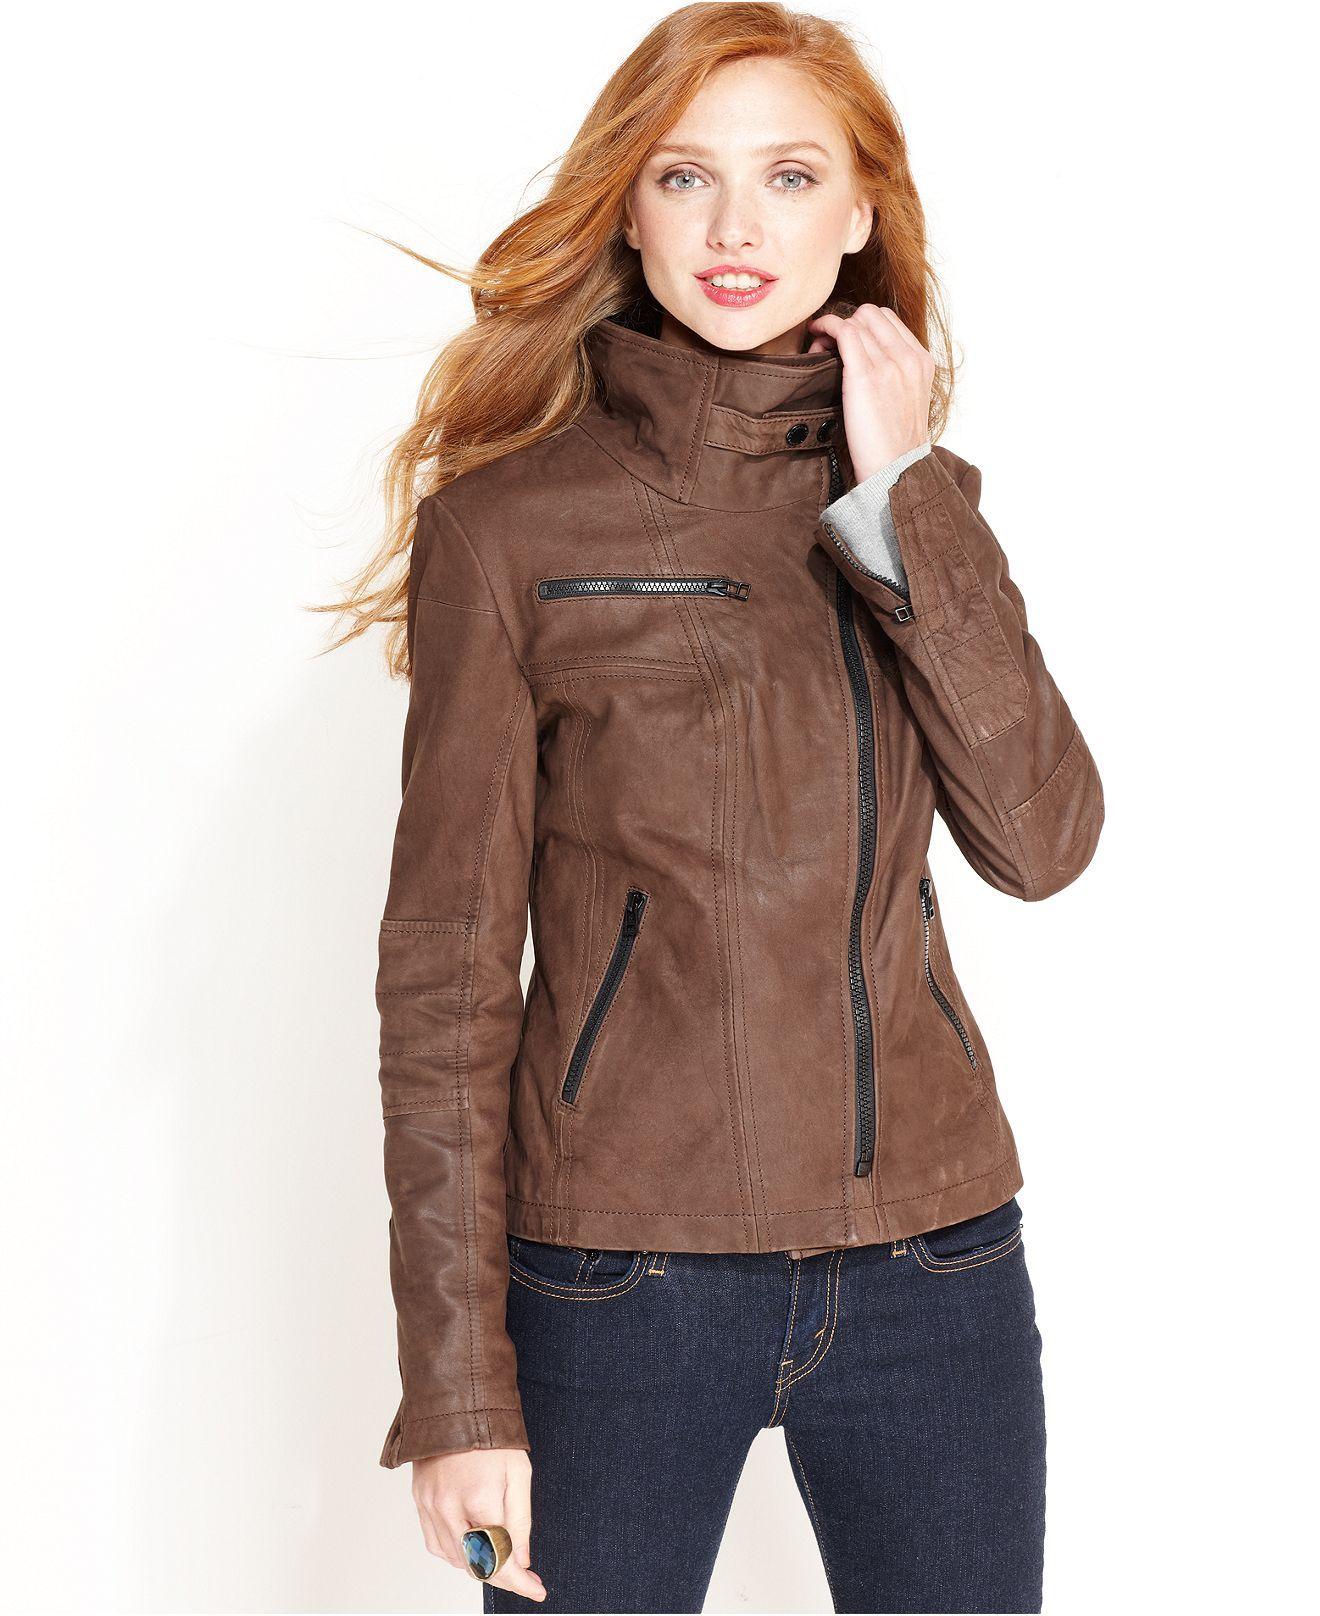 Buffalo David Bitton Jacket Leather Motorcycle Juniors Coats Macy S Jackets Coats For Women Leather Jacket [ 1616 x 1320 Pixel ]